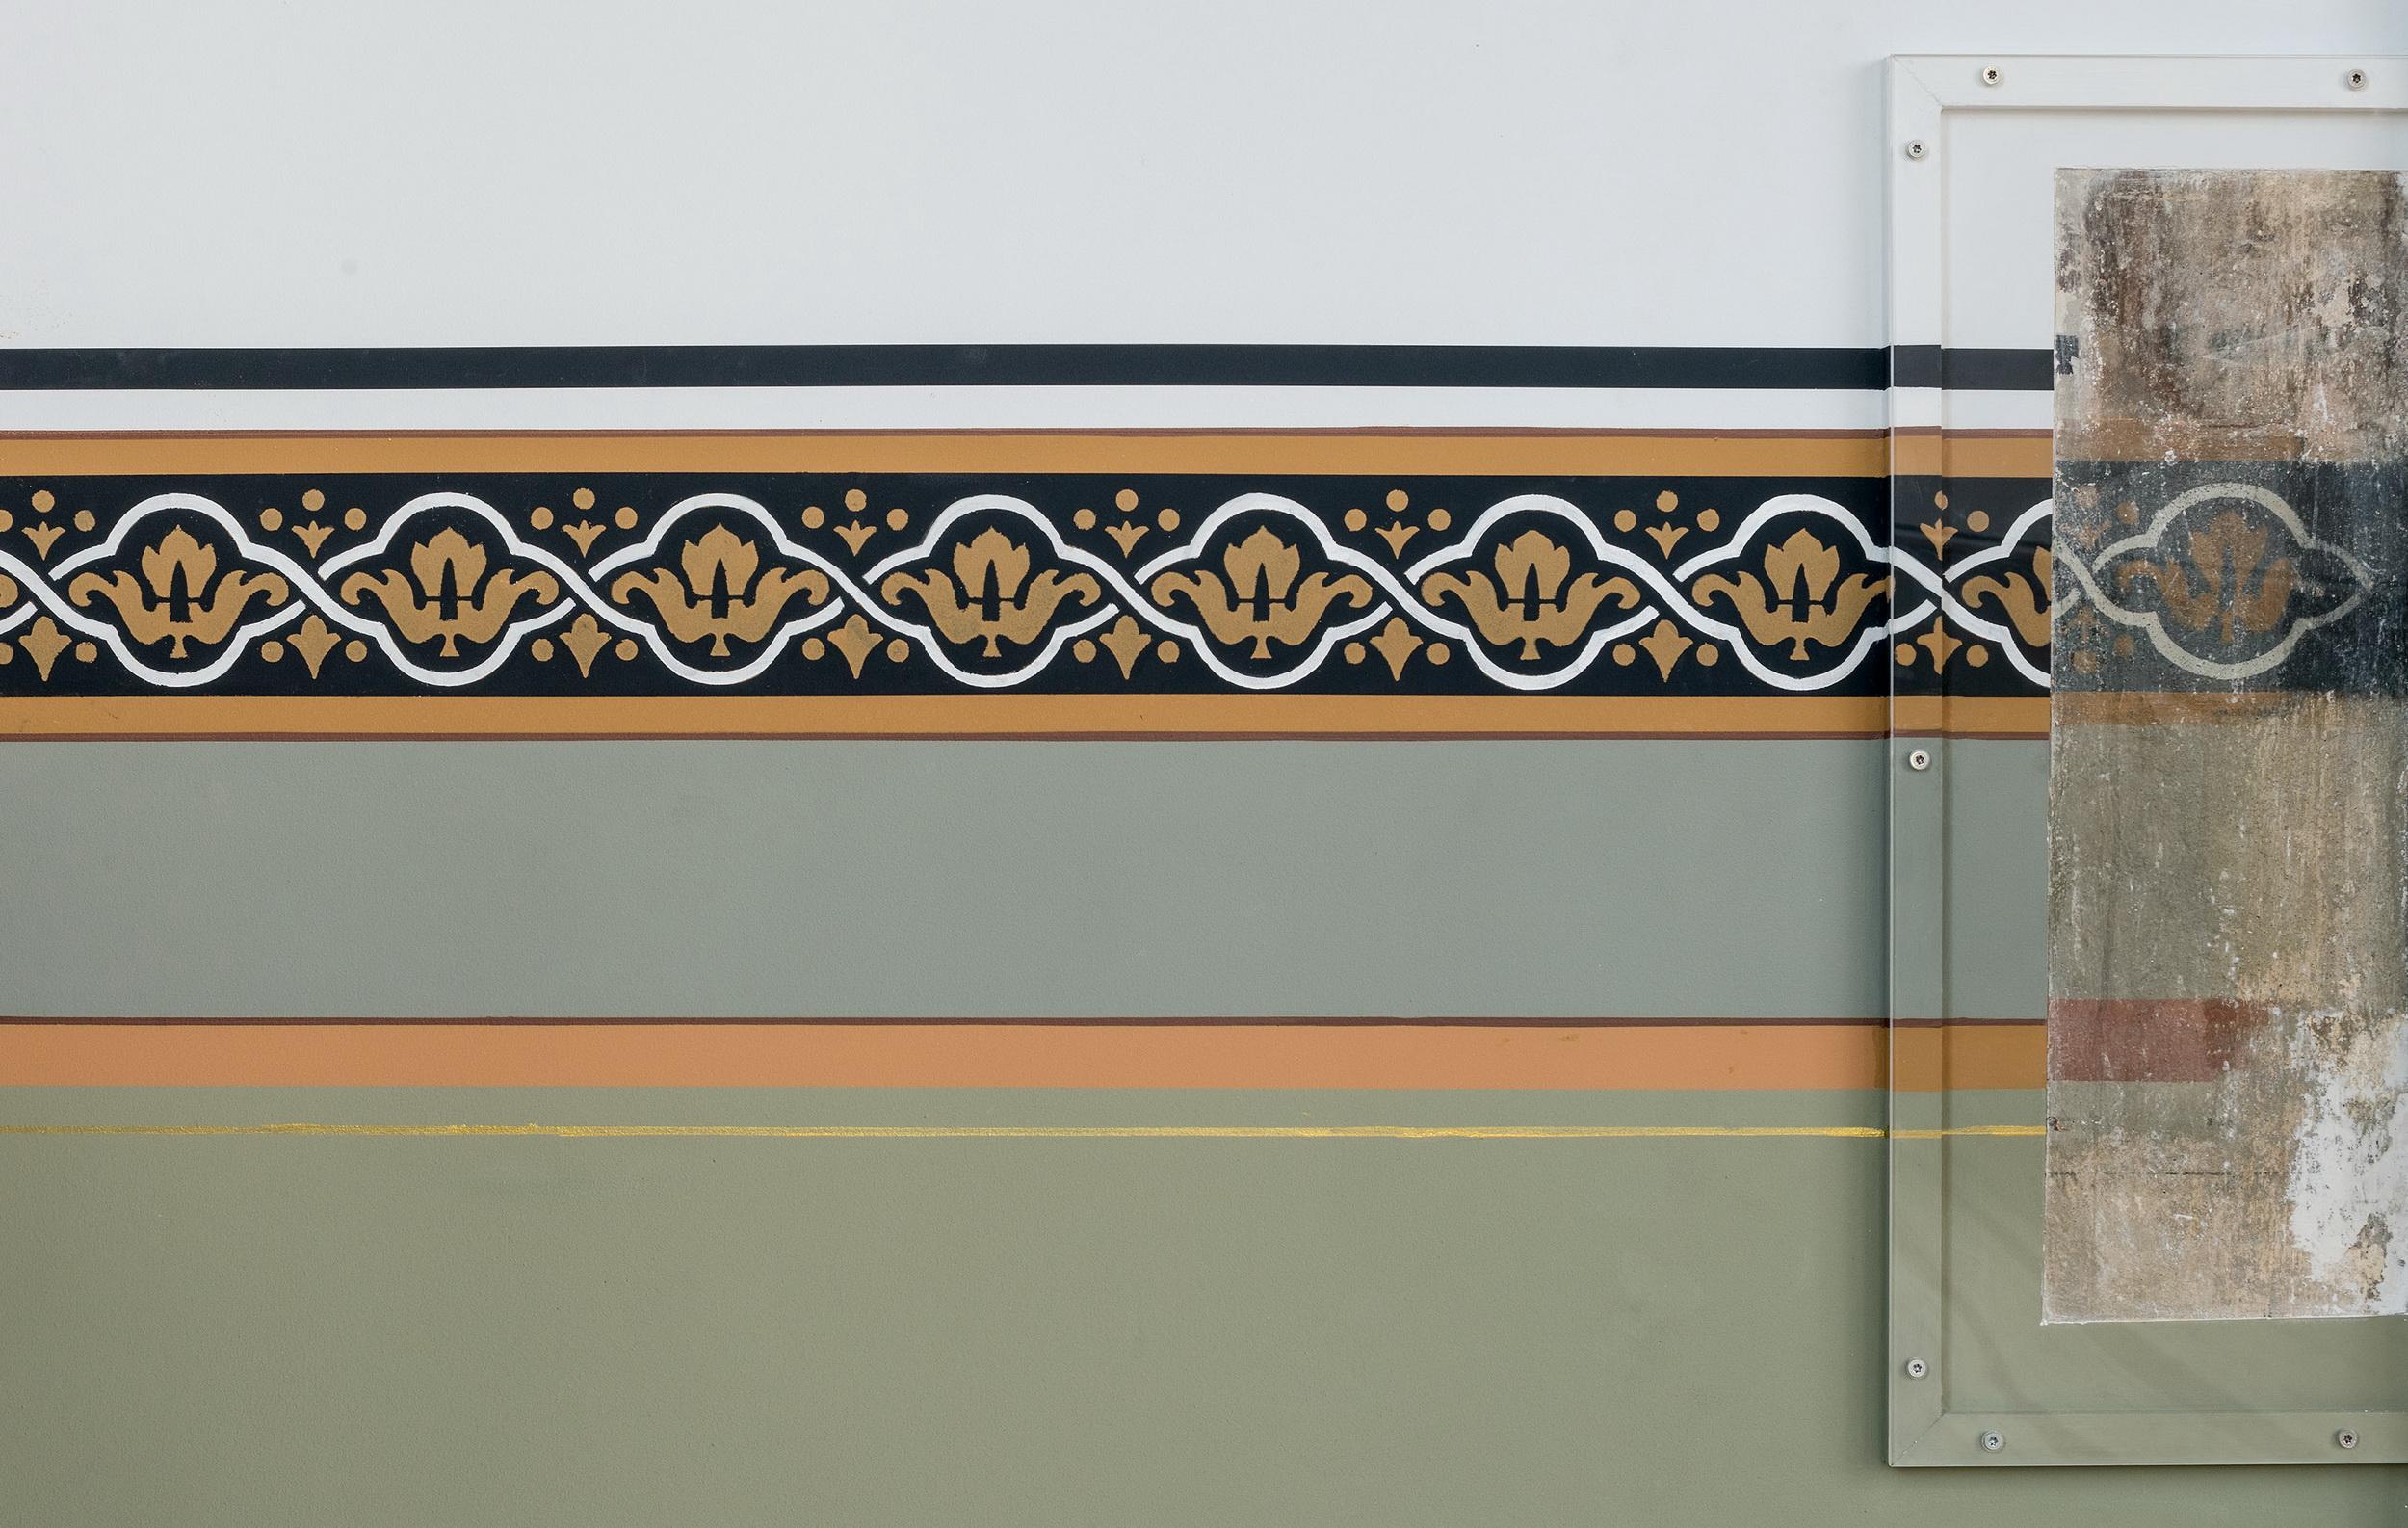 Historische Wandbemalung in der Aula des Mitte Museums (Detail)